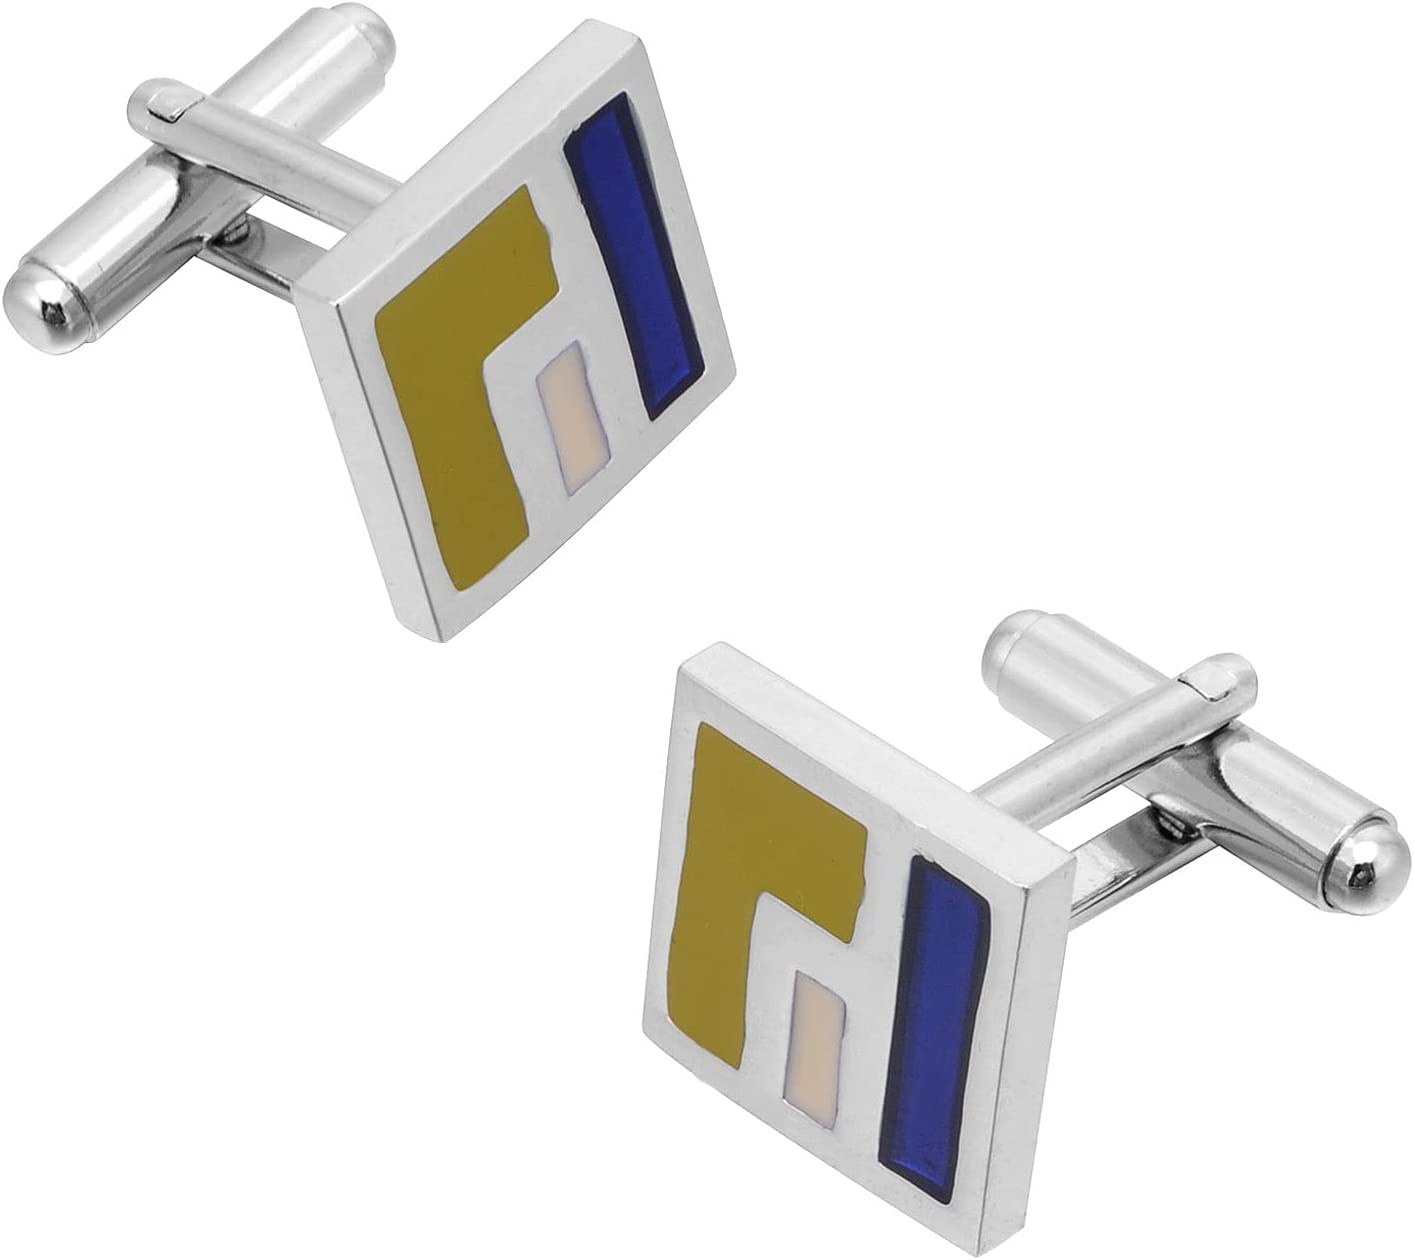 BO LAI DE Men's Cufflinks Fun Geometric Square Color Glazed Cuff Links Shirt Cufflinks Suitable for Wedding Business Luxury Tuxedo Formal Shirts, with Gift Box